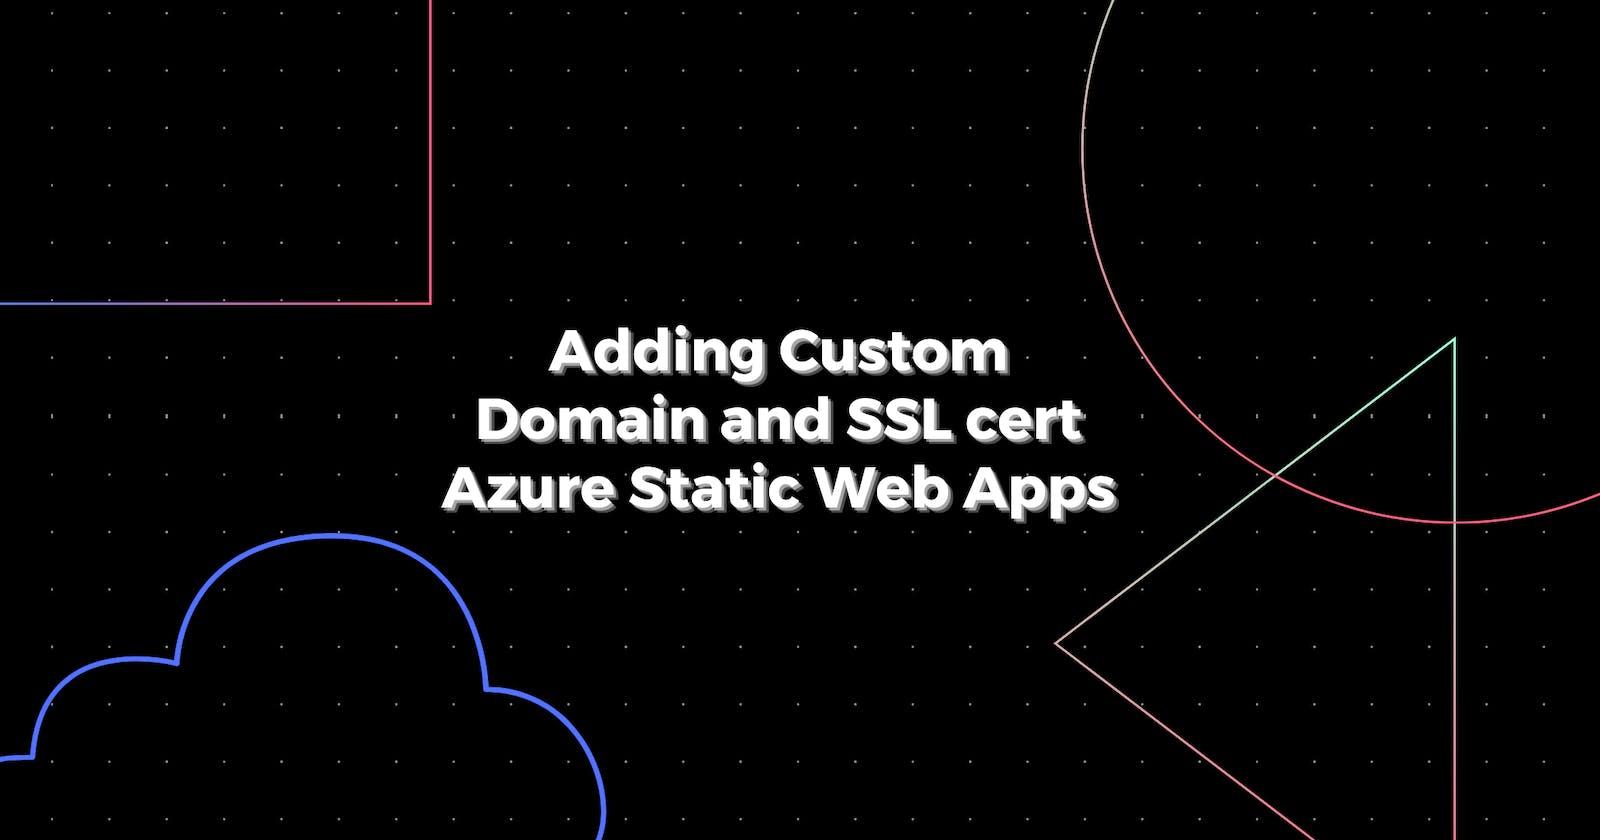 Adding custom domain and SSL certificate Azure Static Web Apps